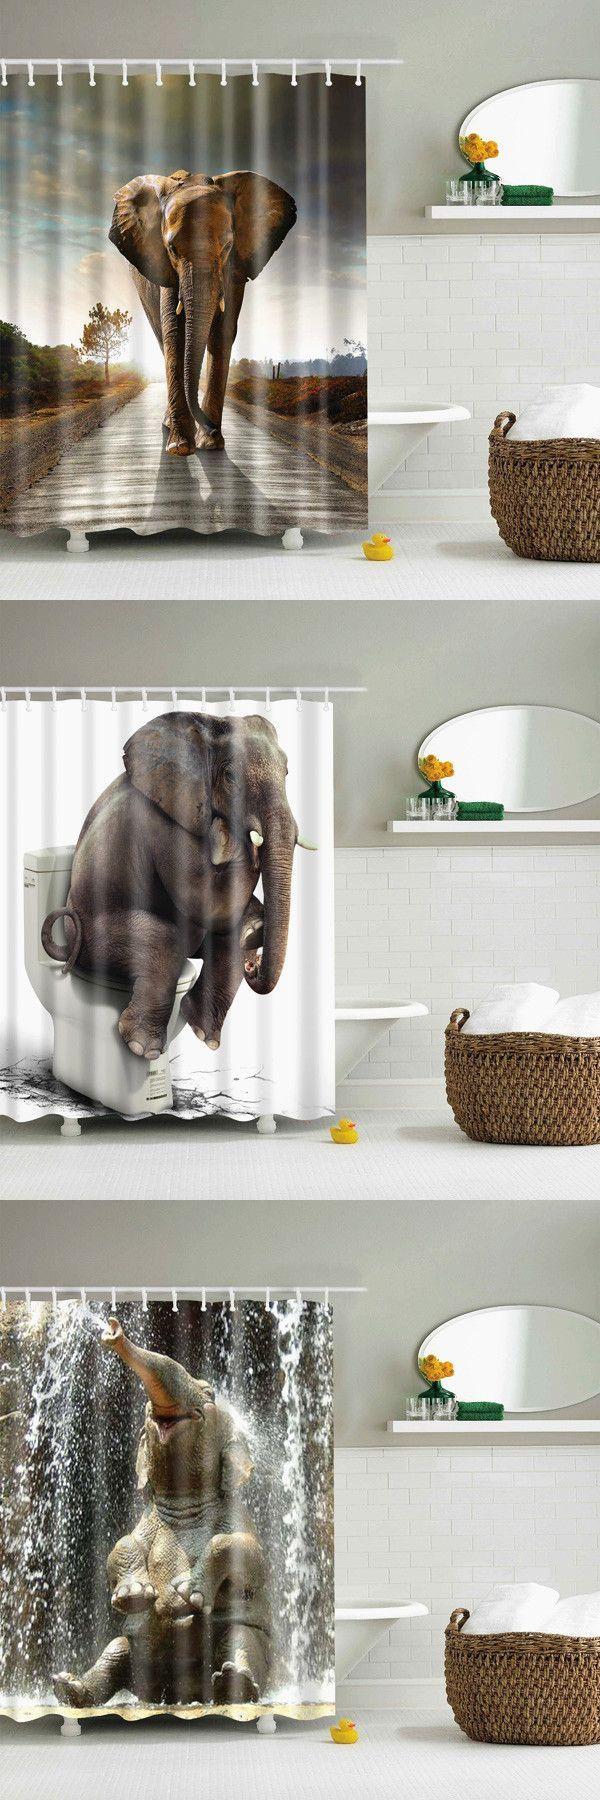 Elephant Sunset Bathroom Shower Curtain - Brown